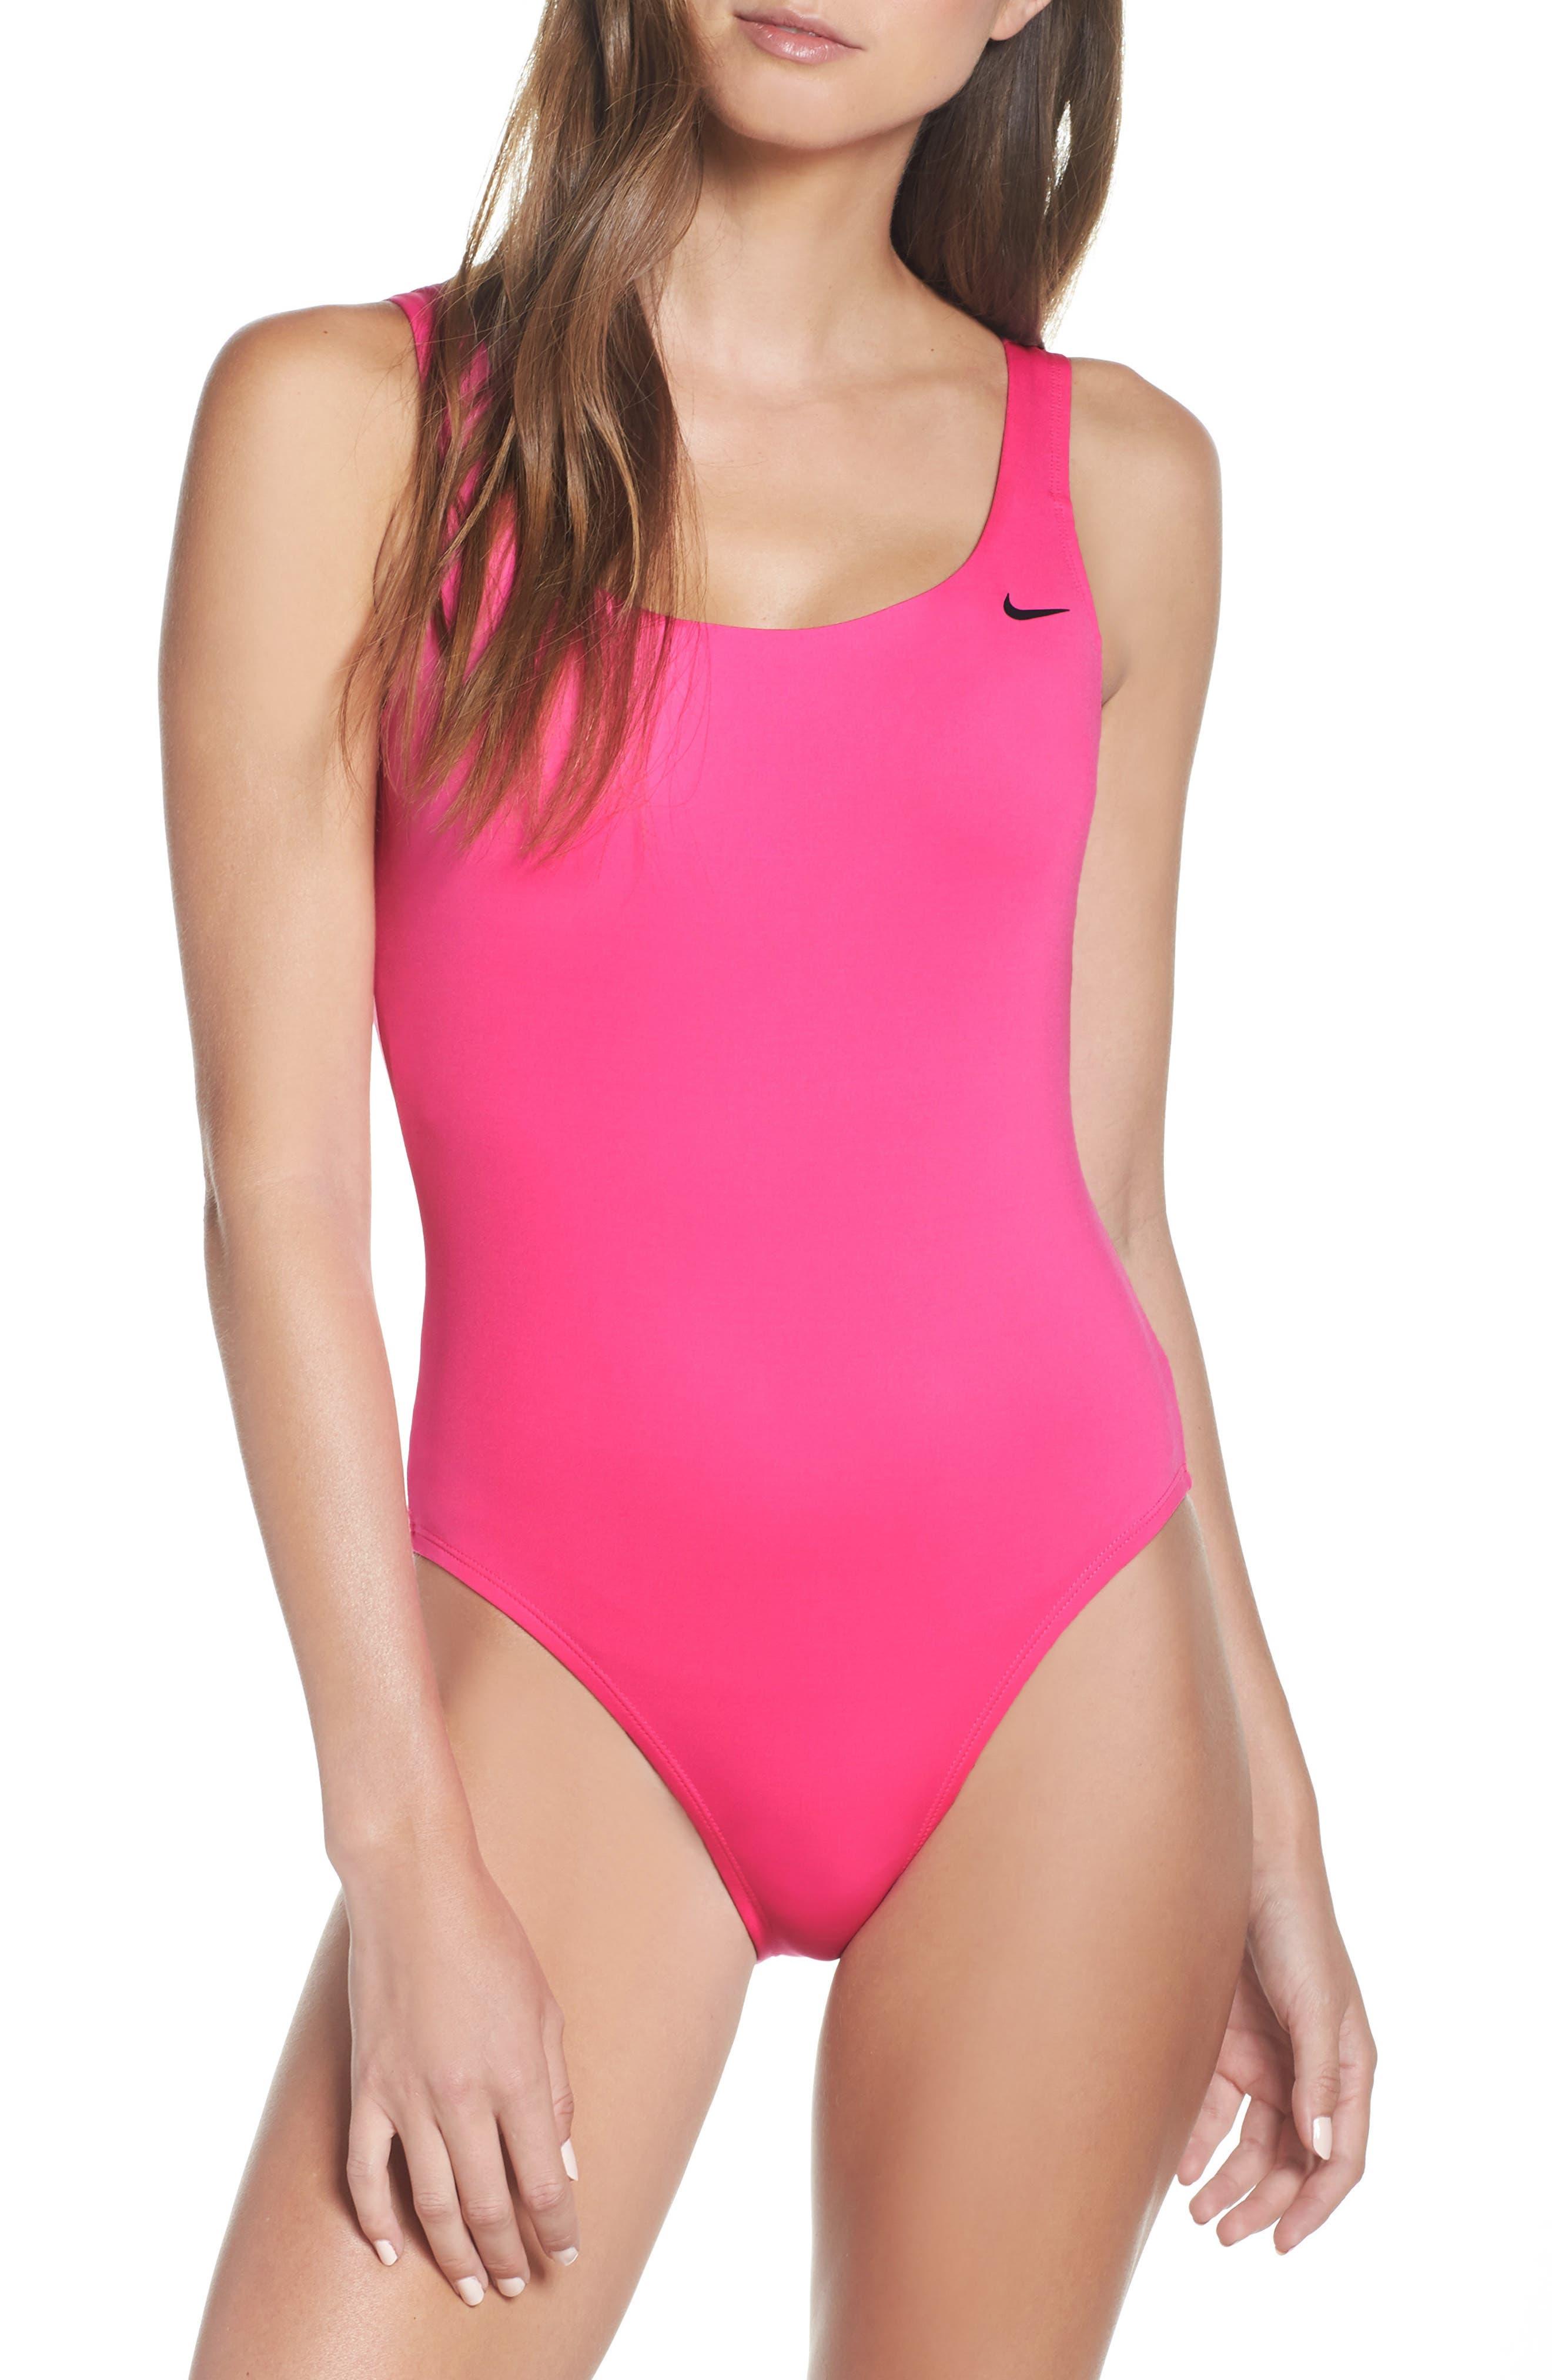 Nike U-Back One-Piece Swimsuit, Pink